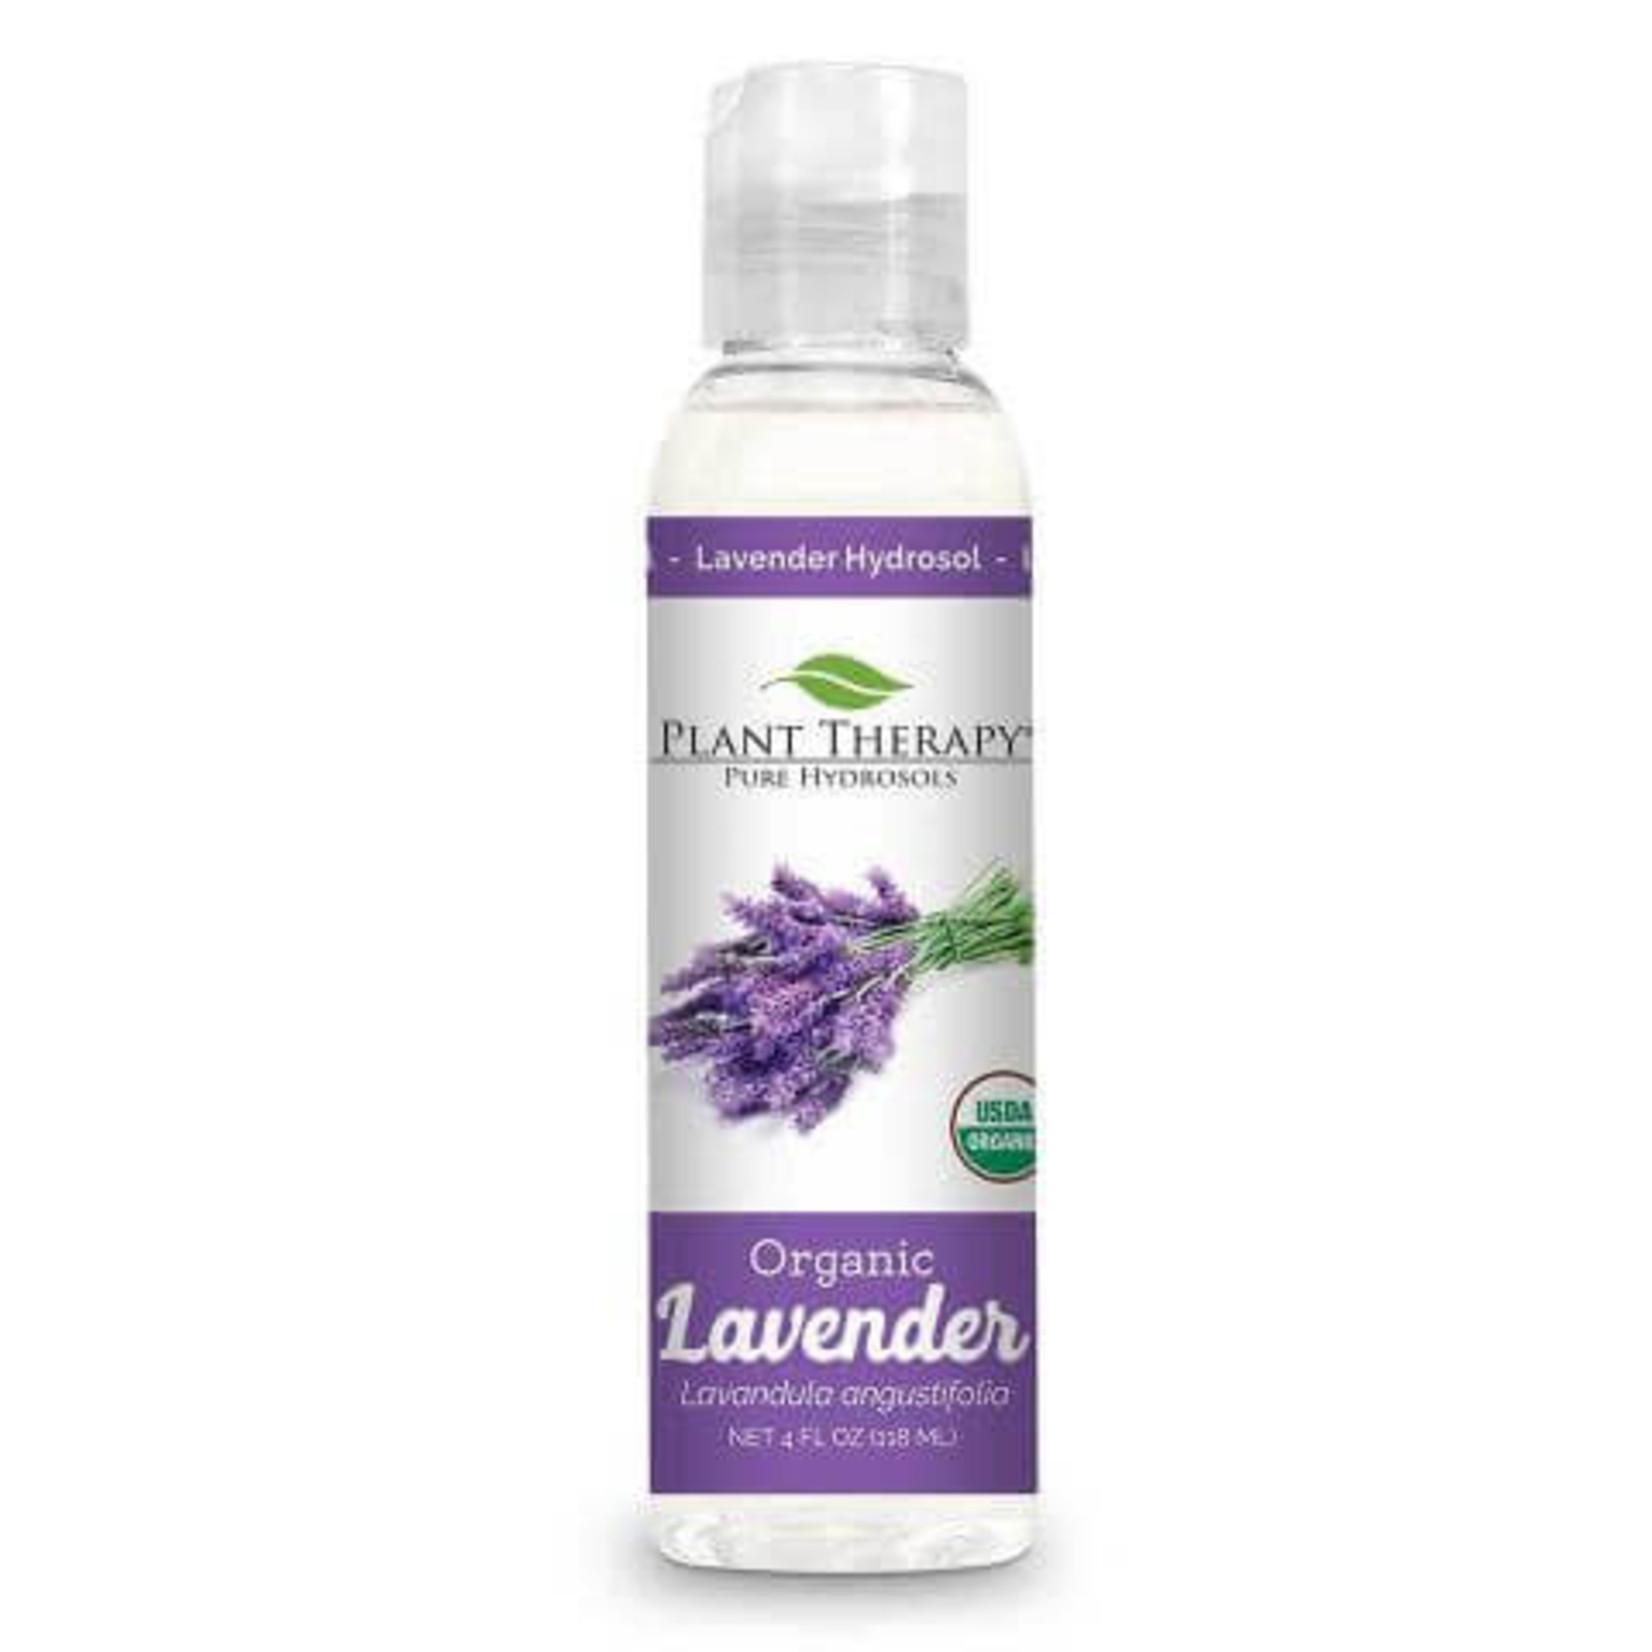 Plant Therapy PT Organic Lavender Hydrosol 4oz